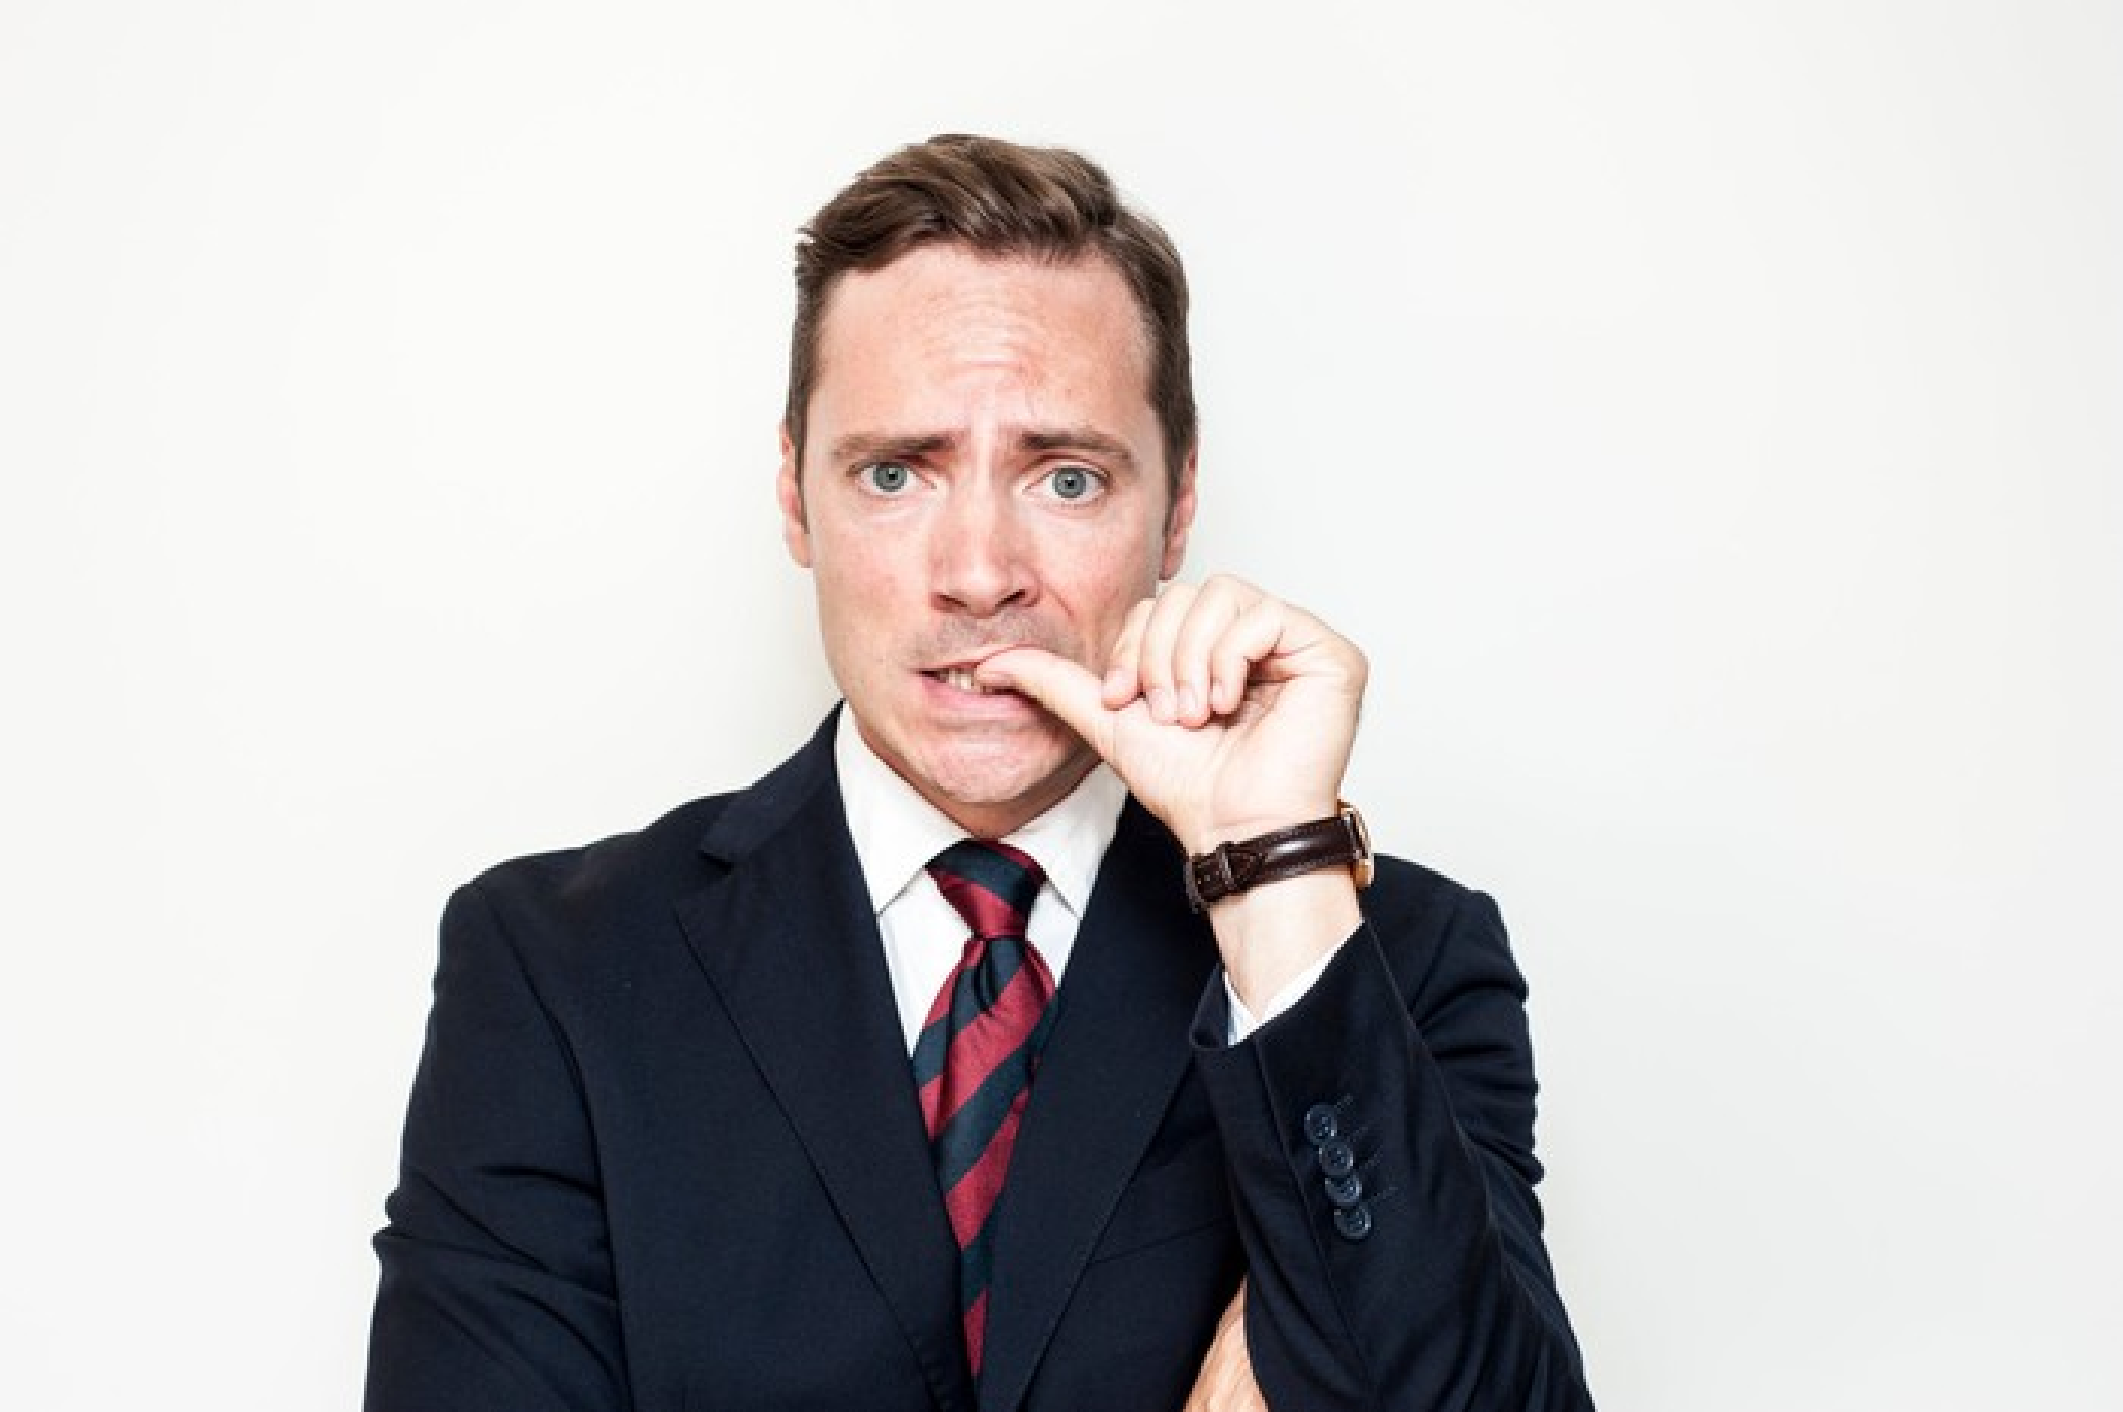 Nervous-looking man biting his finger.